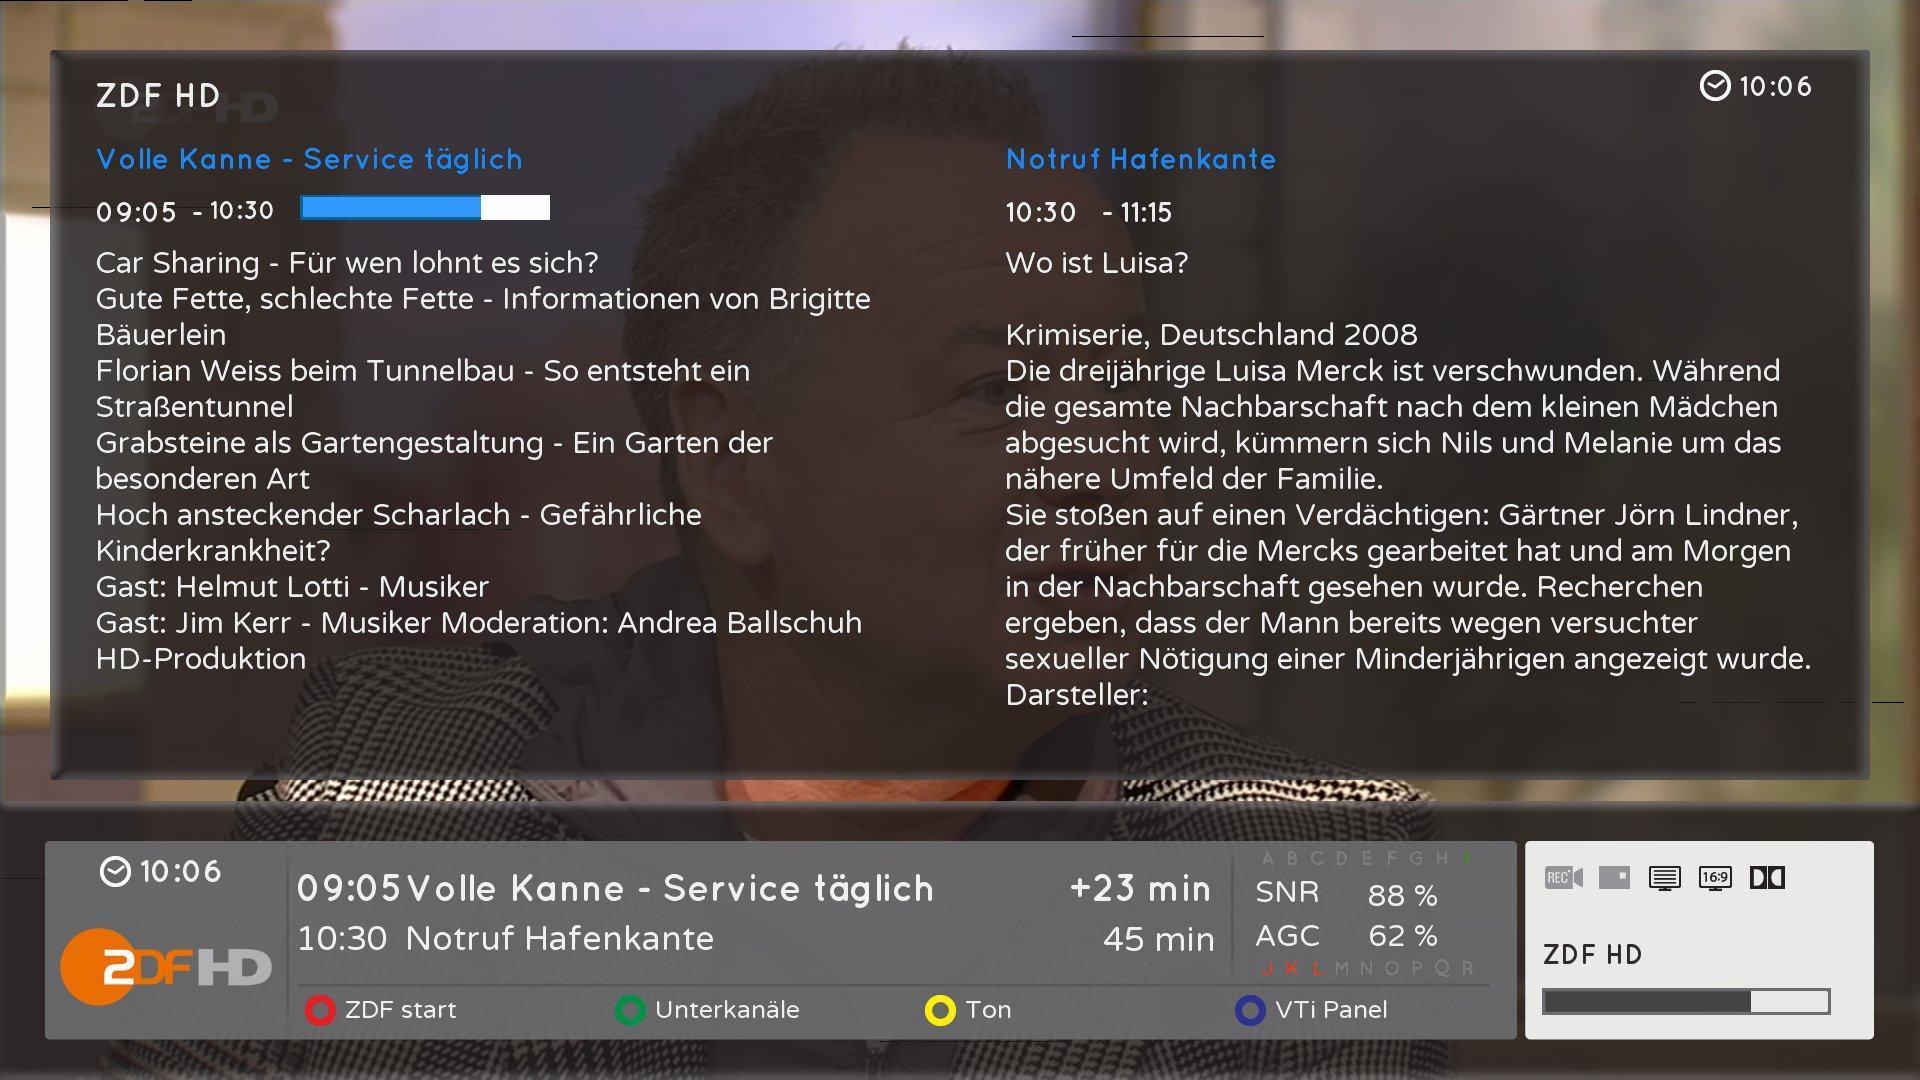 VTi 11.0 Image passend zum Start der VU+ Uno 4K erschienen techboys.de • smarte News, auf den Punkt!